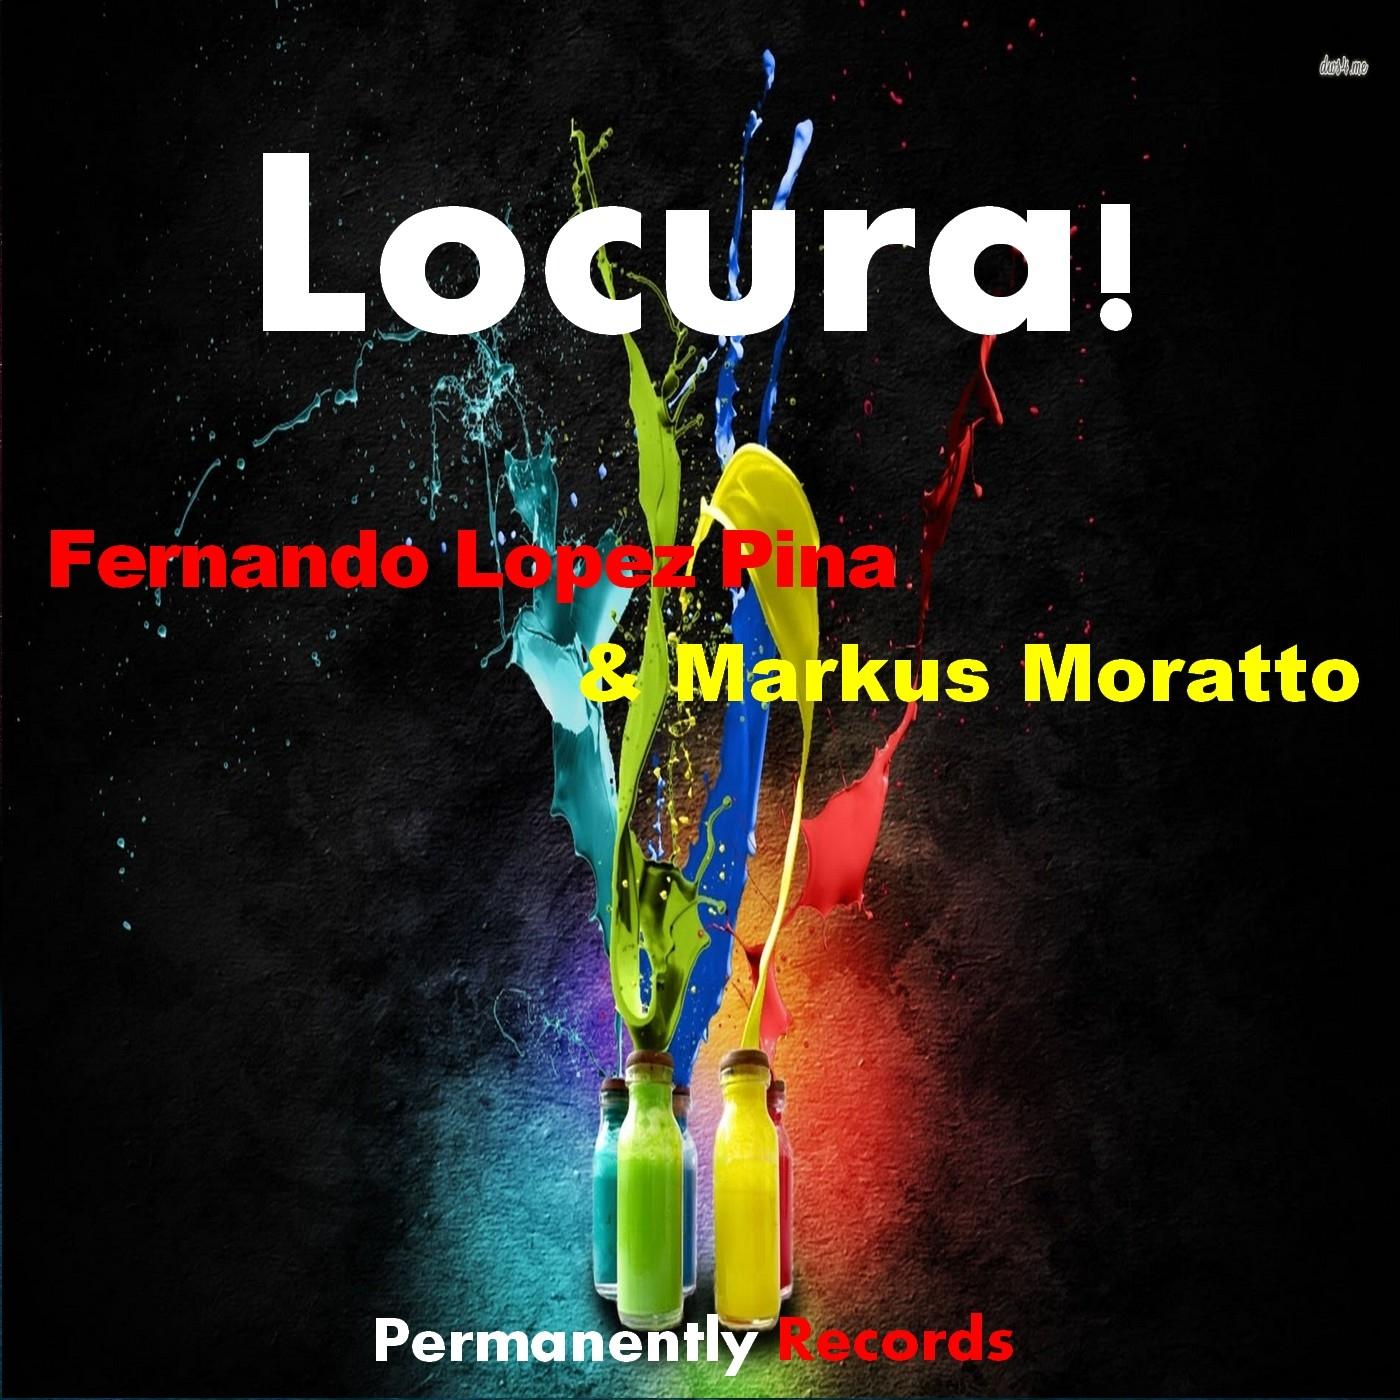 Fernando Lopez Pina & Markus Moratto - Locura! (Original mix)